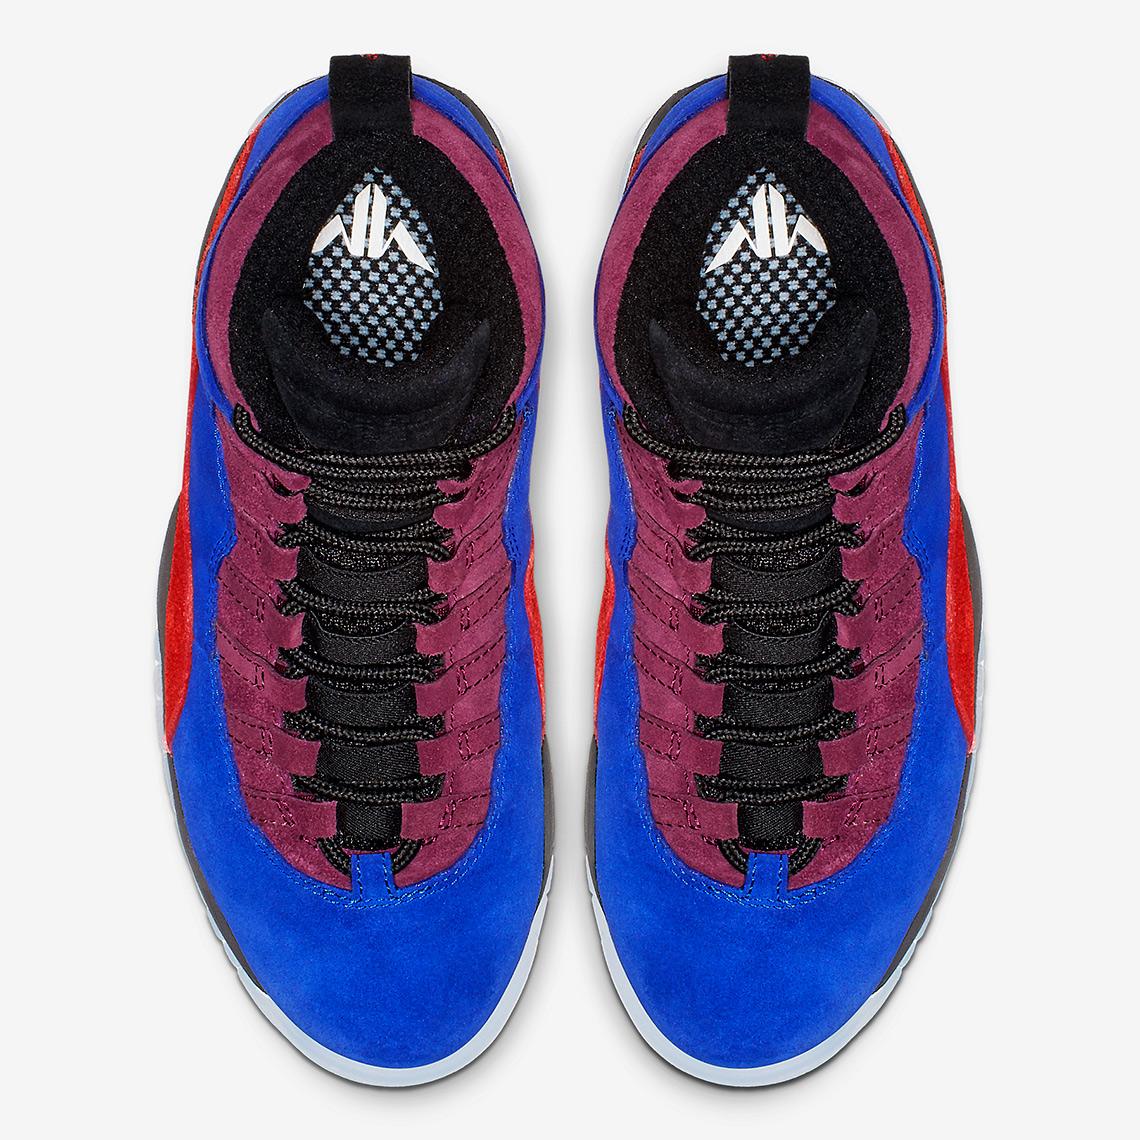 d552f703a7065d Maya Moore Air Jordan 10 Store List